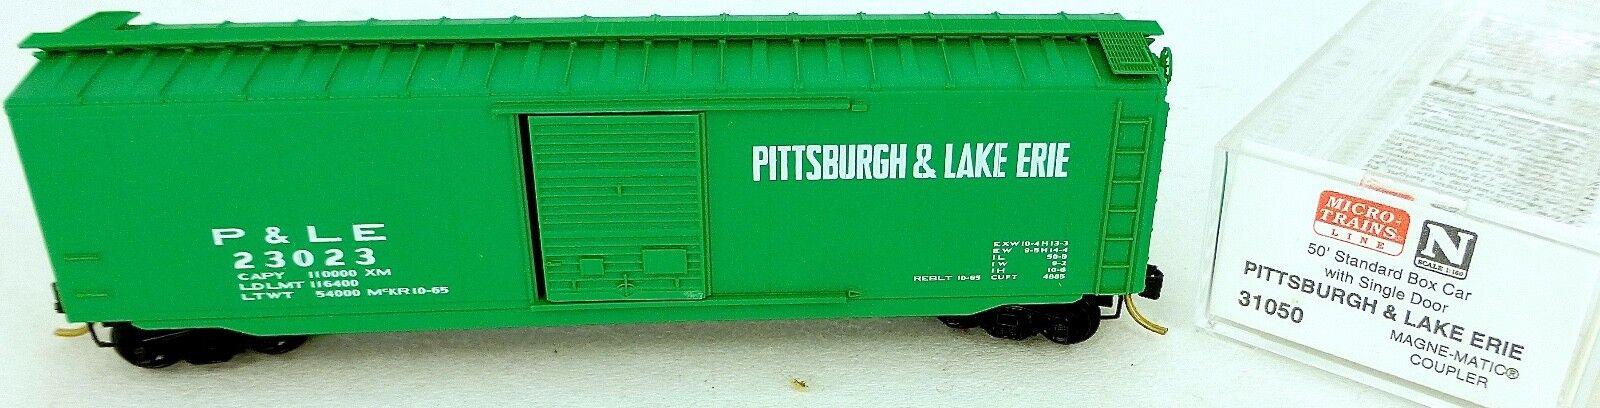 50' standard boxcar pittsburgh erie 23023 micro trains line 31050 n 1 160 C å